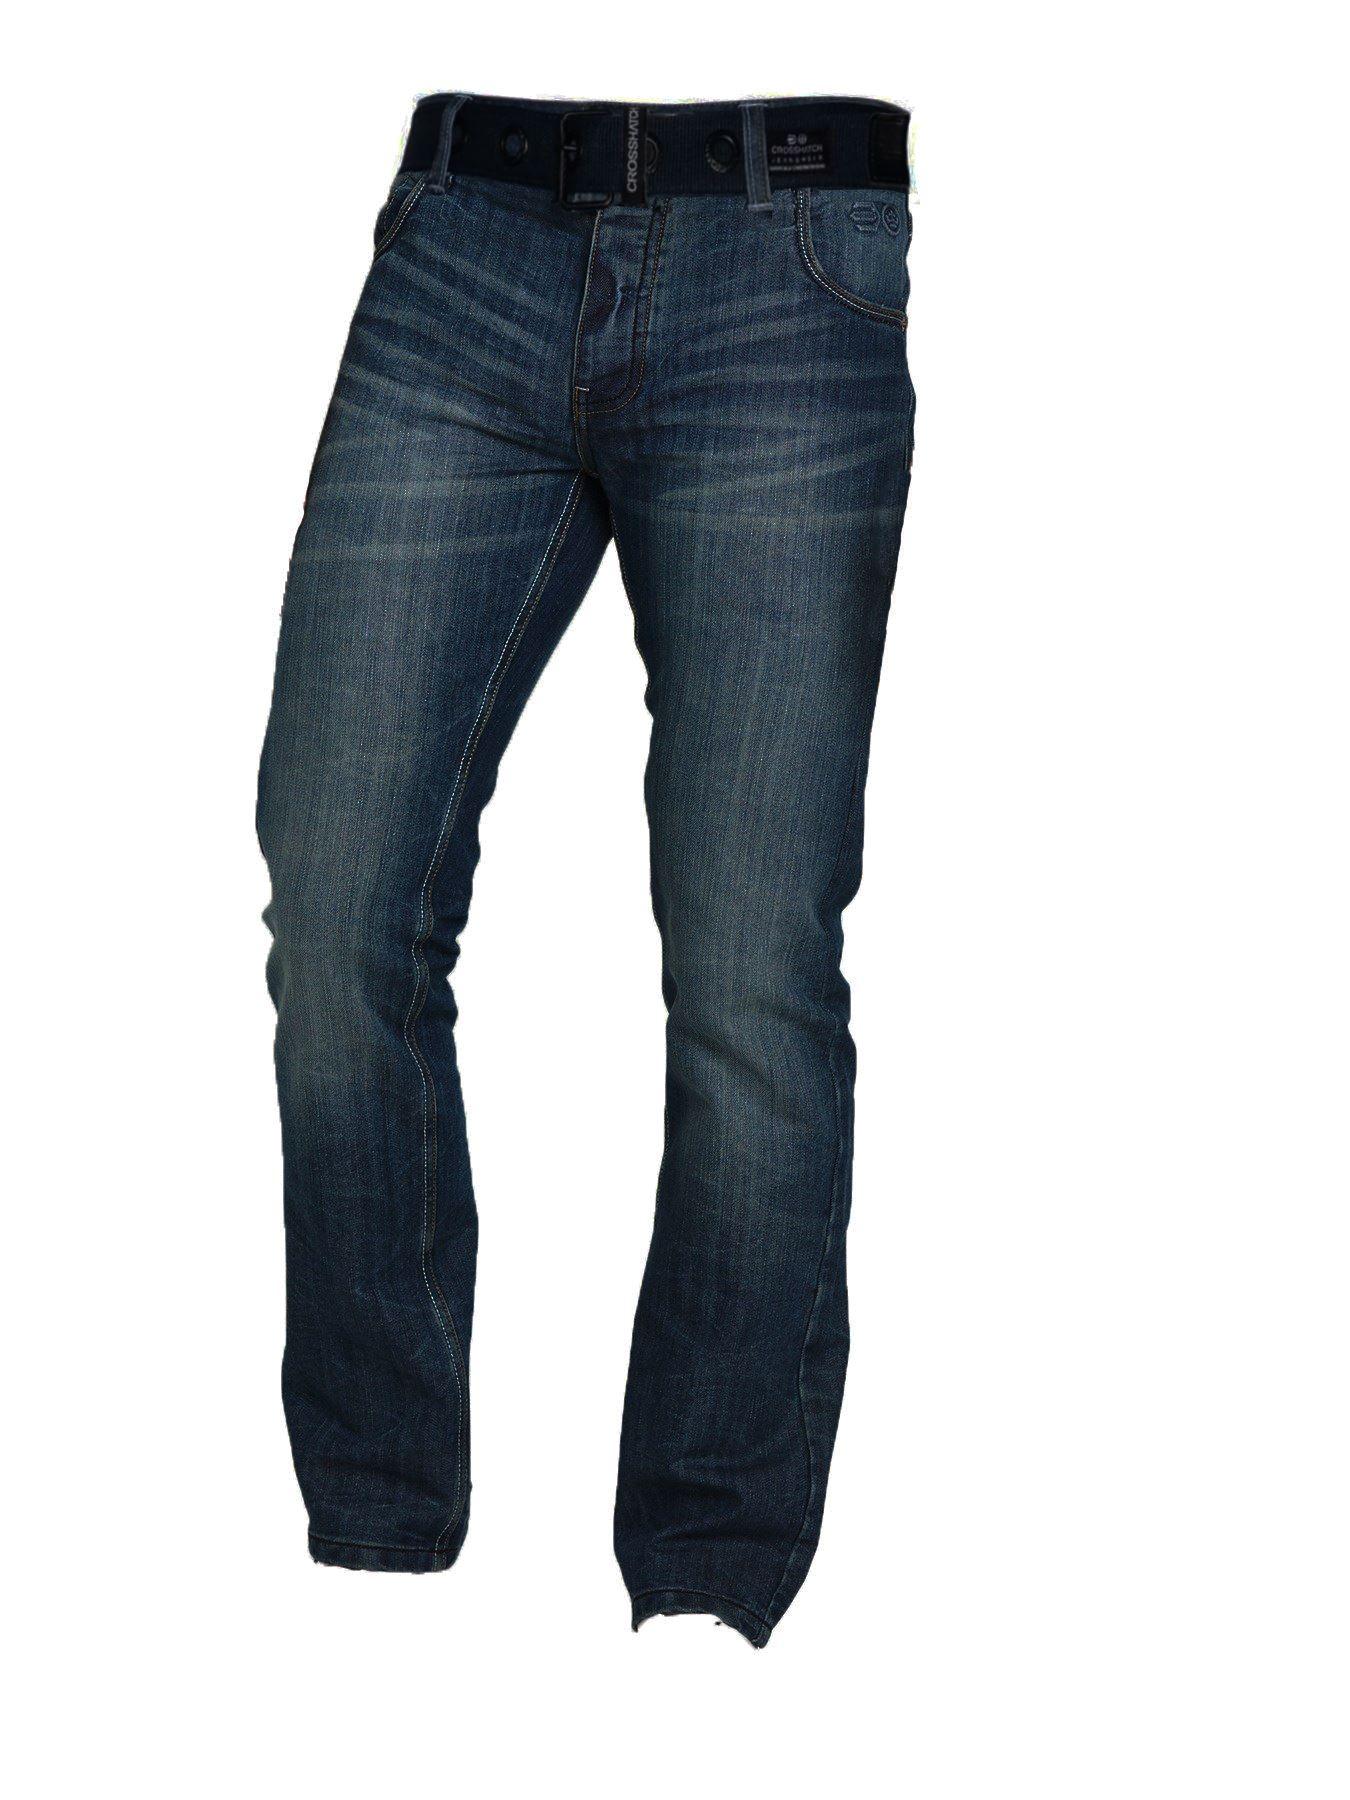 New-Mens-Crosshatch-Designer-Regular-Fit-Denim-Straight-Leg-Jeans